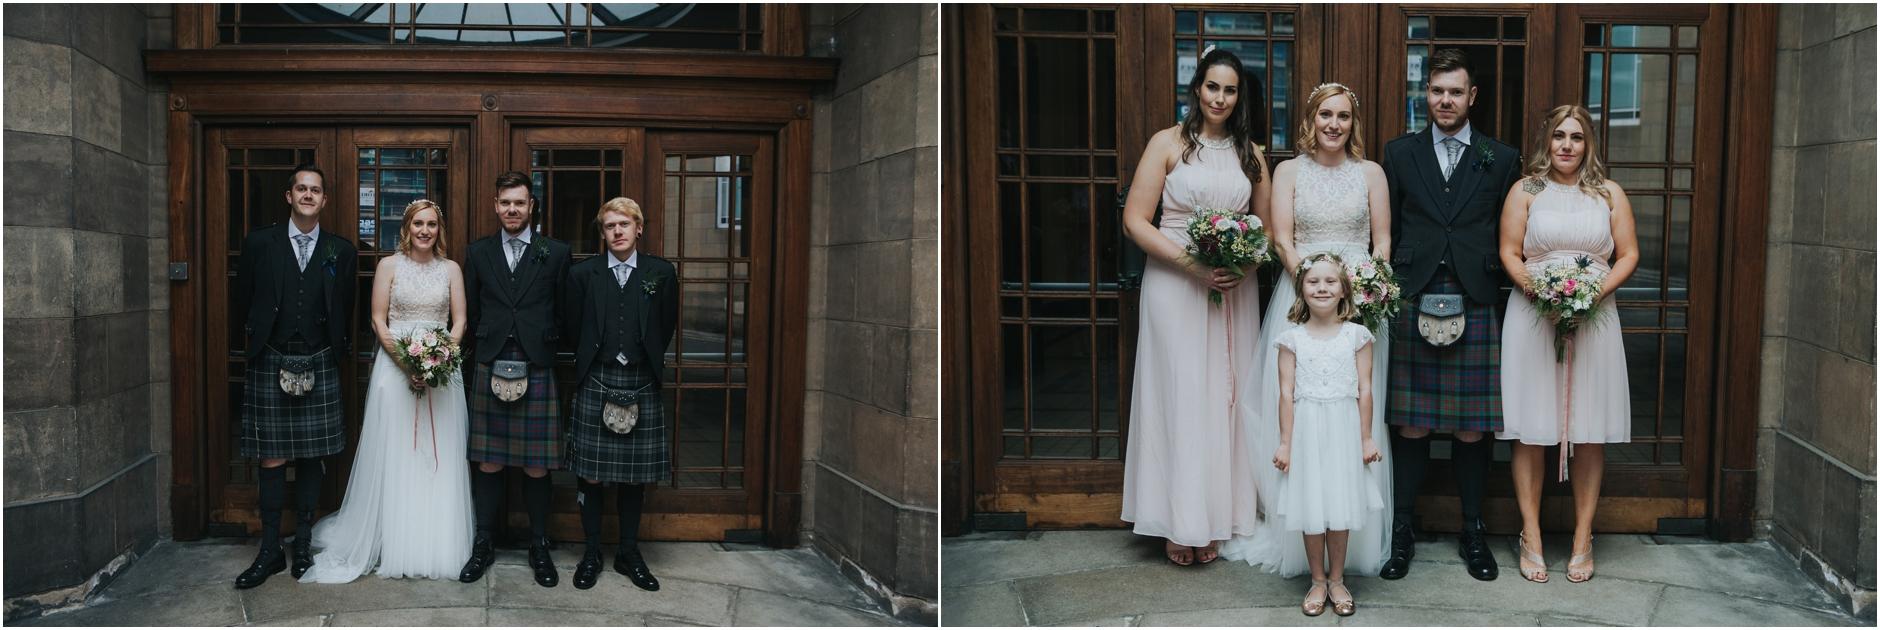 wedding portraits thomas morton hall leith theatre edinburgh